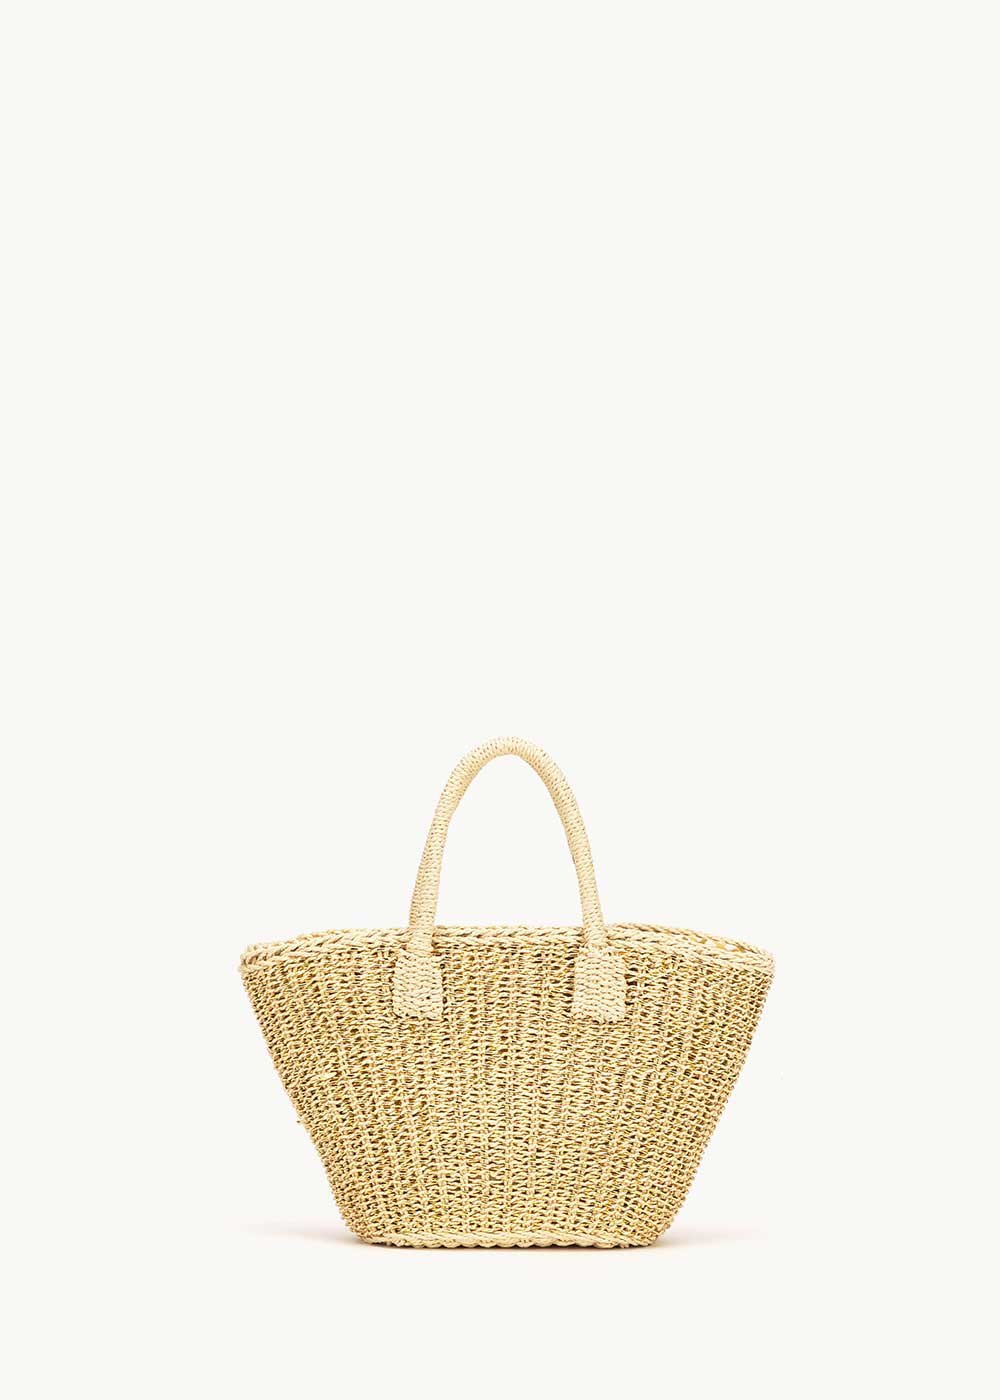 Balia straw bag with shoulder strap - Gold - Woman